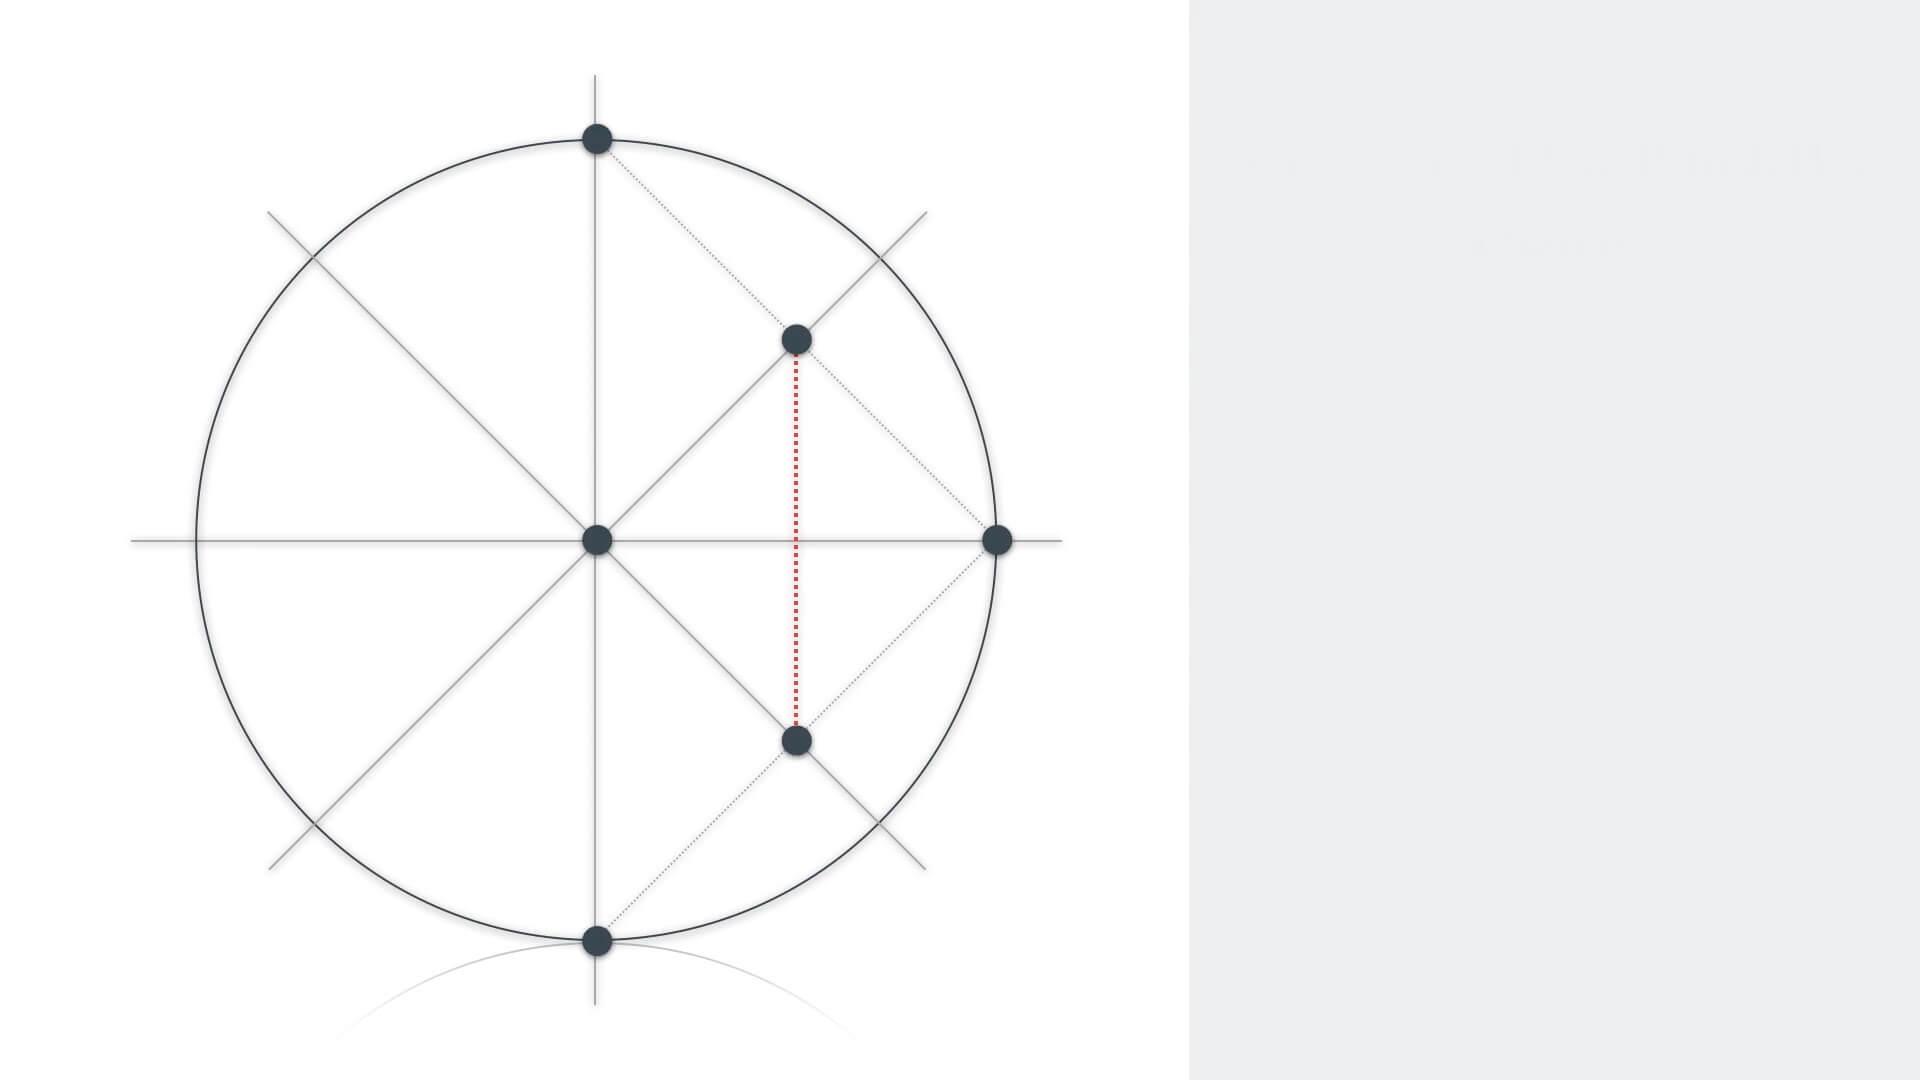 Journal 02 – Basics of Symmetry | 4 & 8 fold constructions